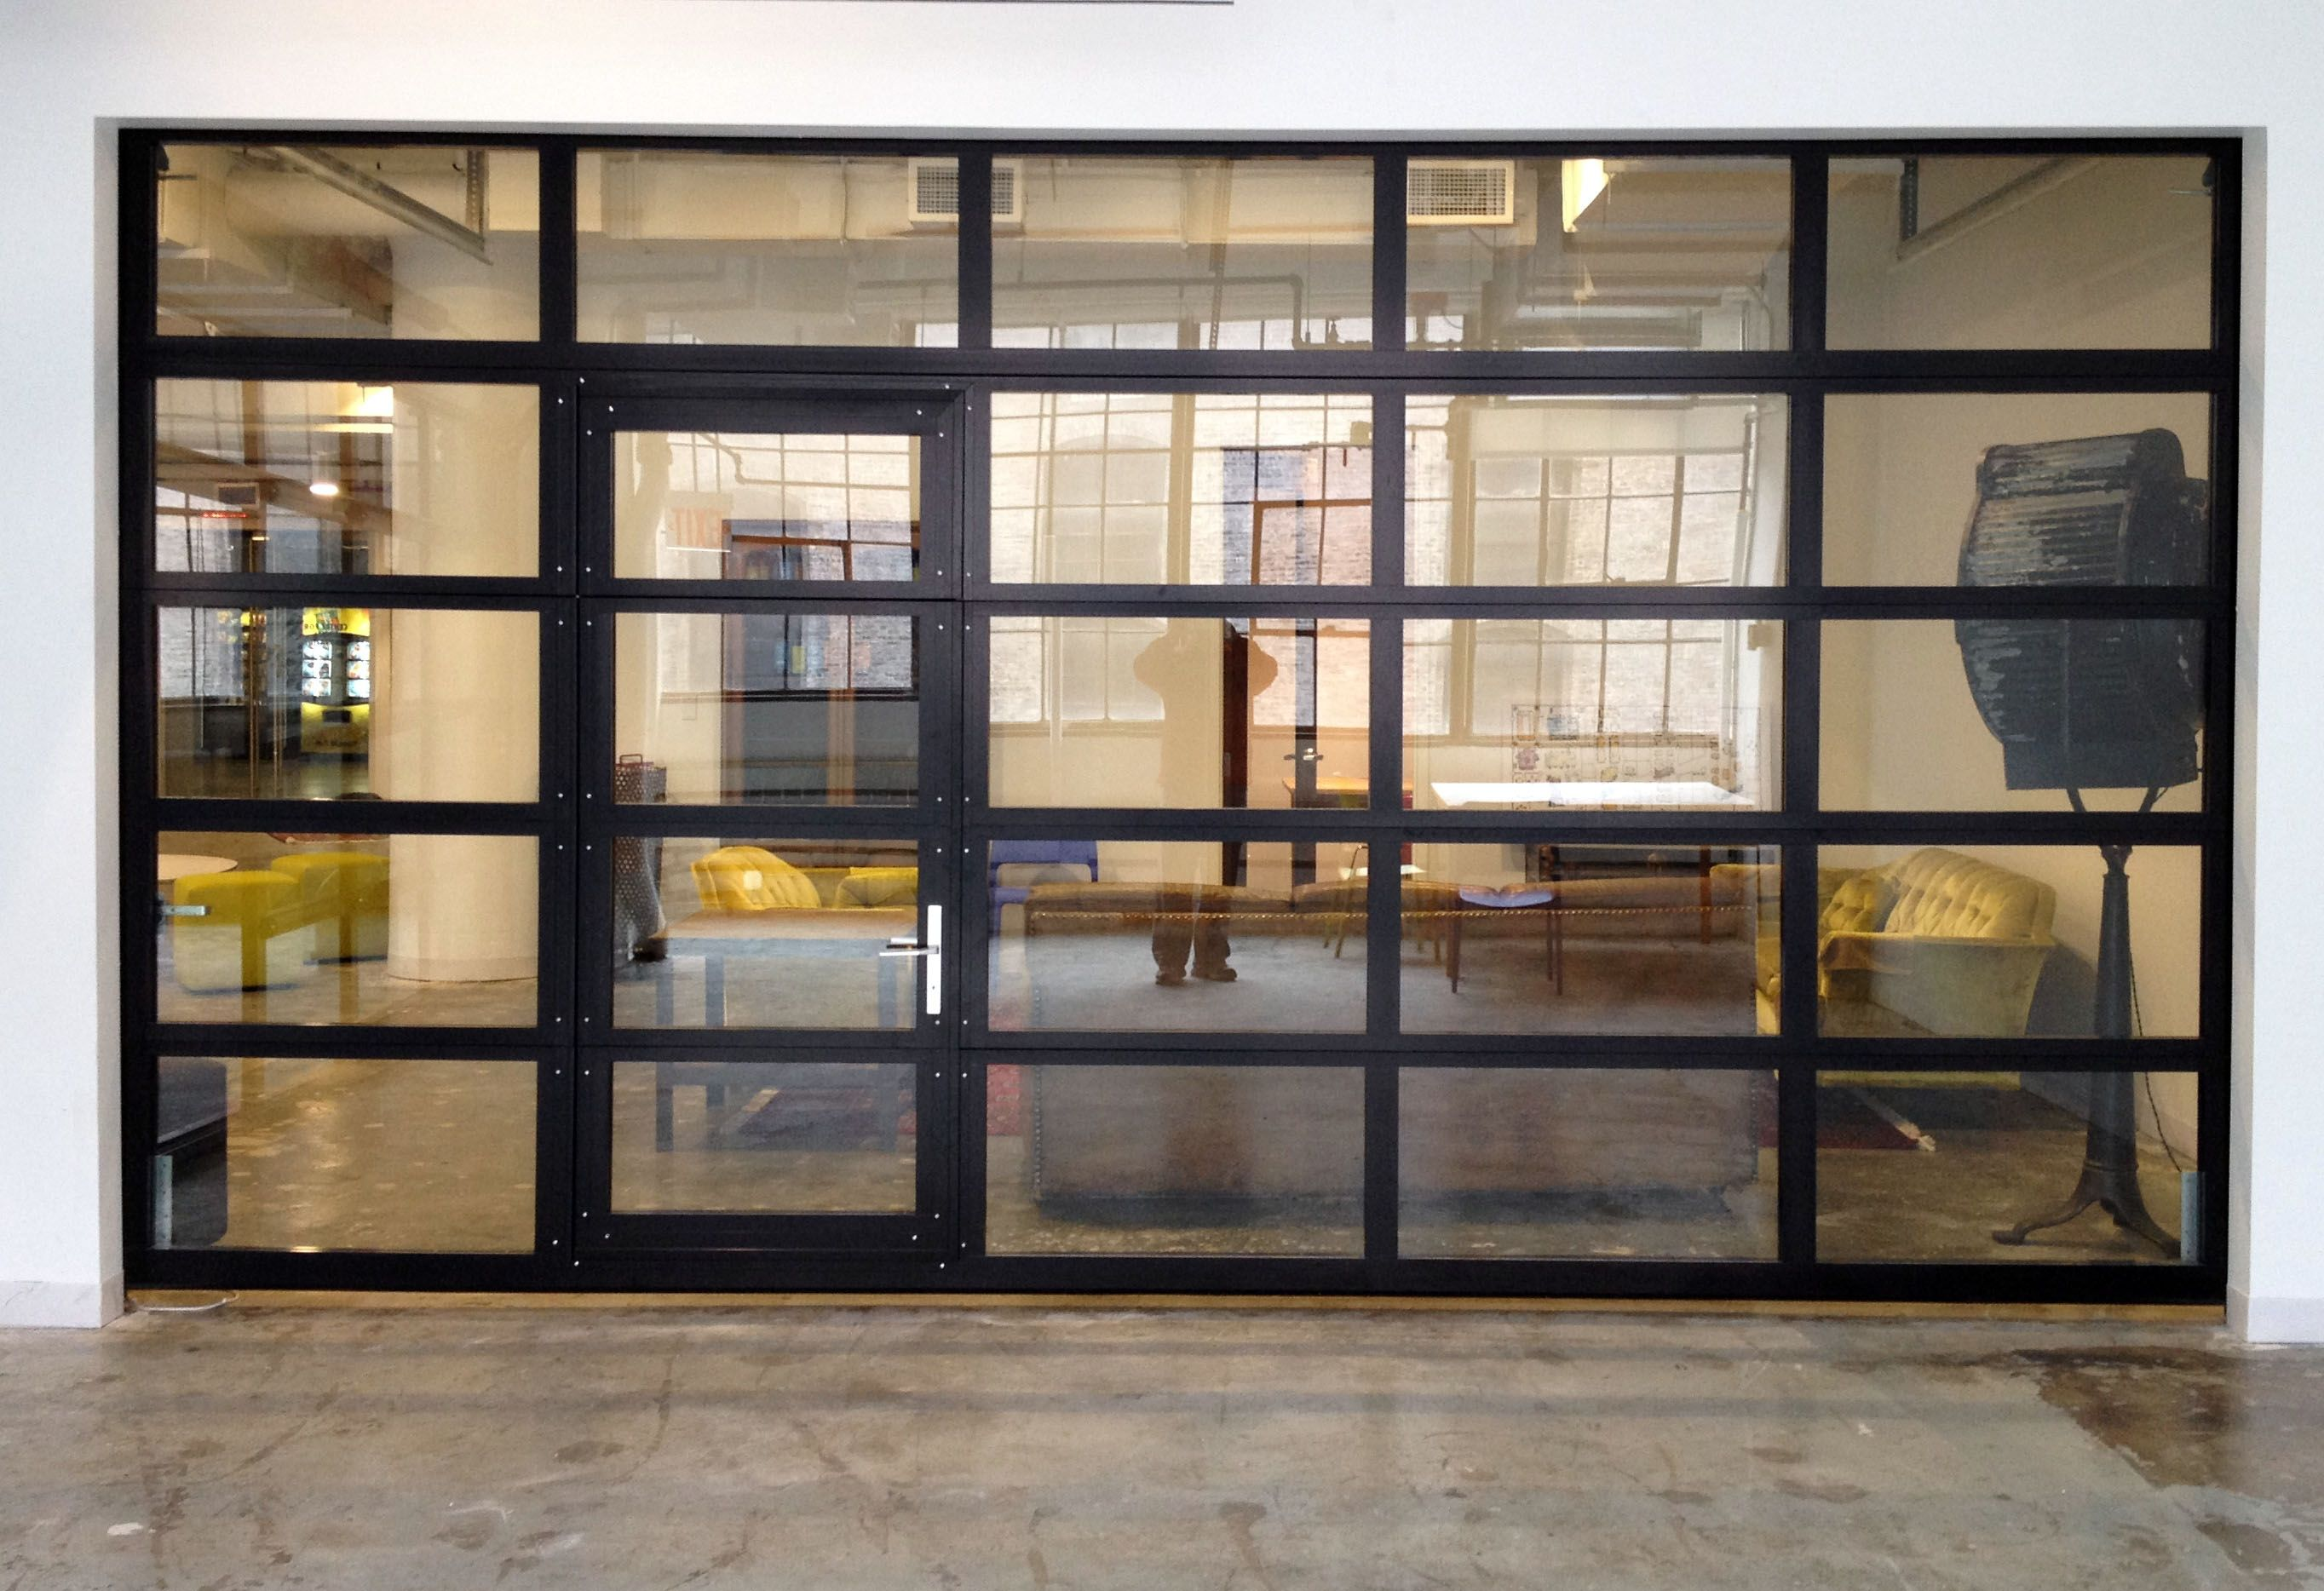 Glass Garage Doors Tulsa Httpvoteno123 Pinterest Glass